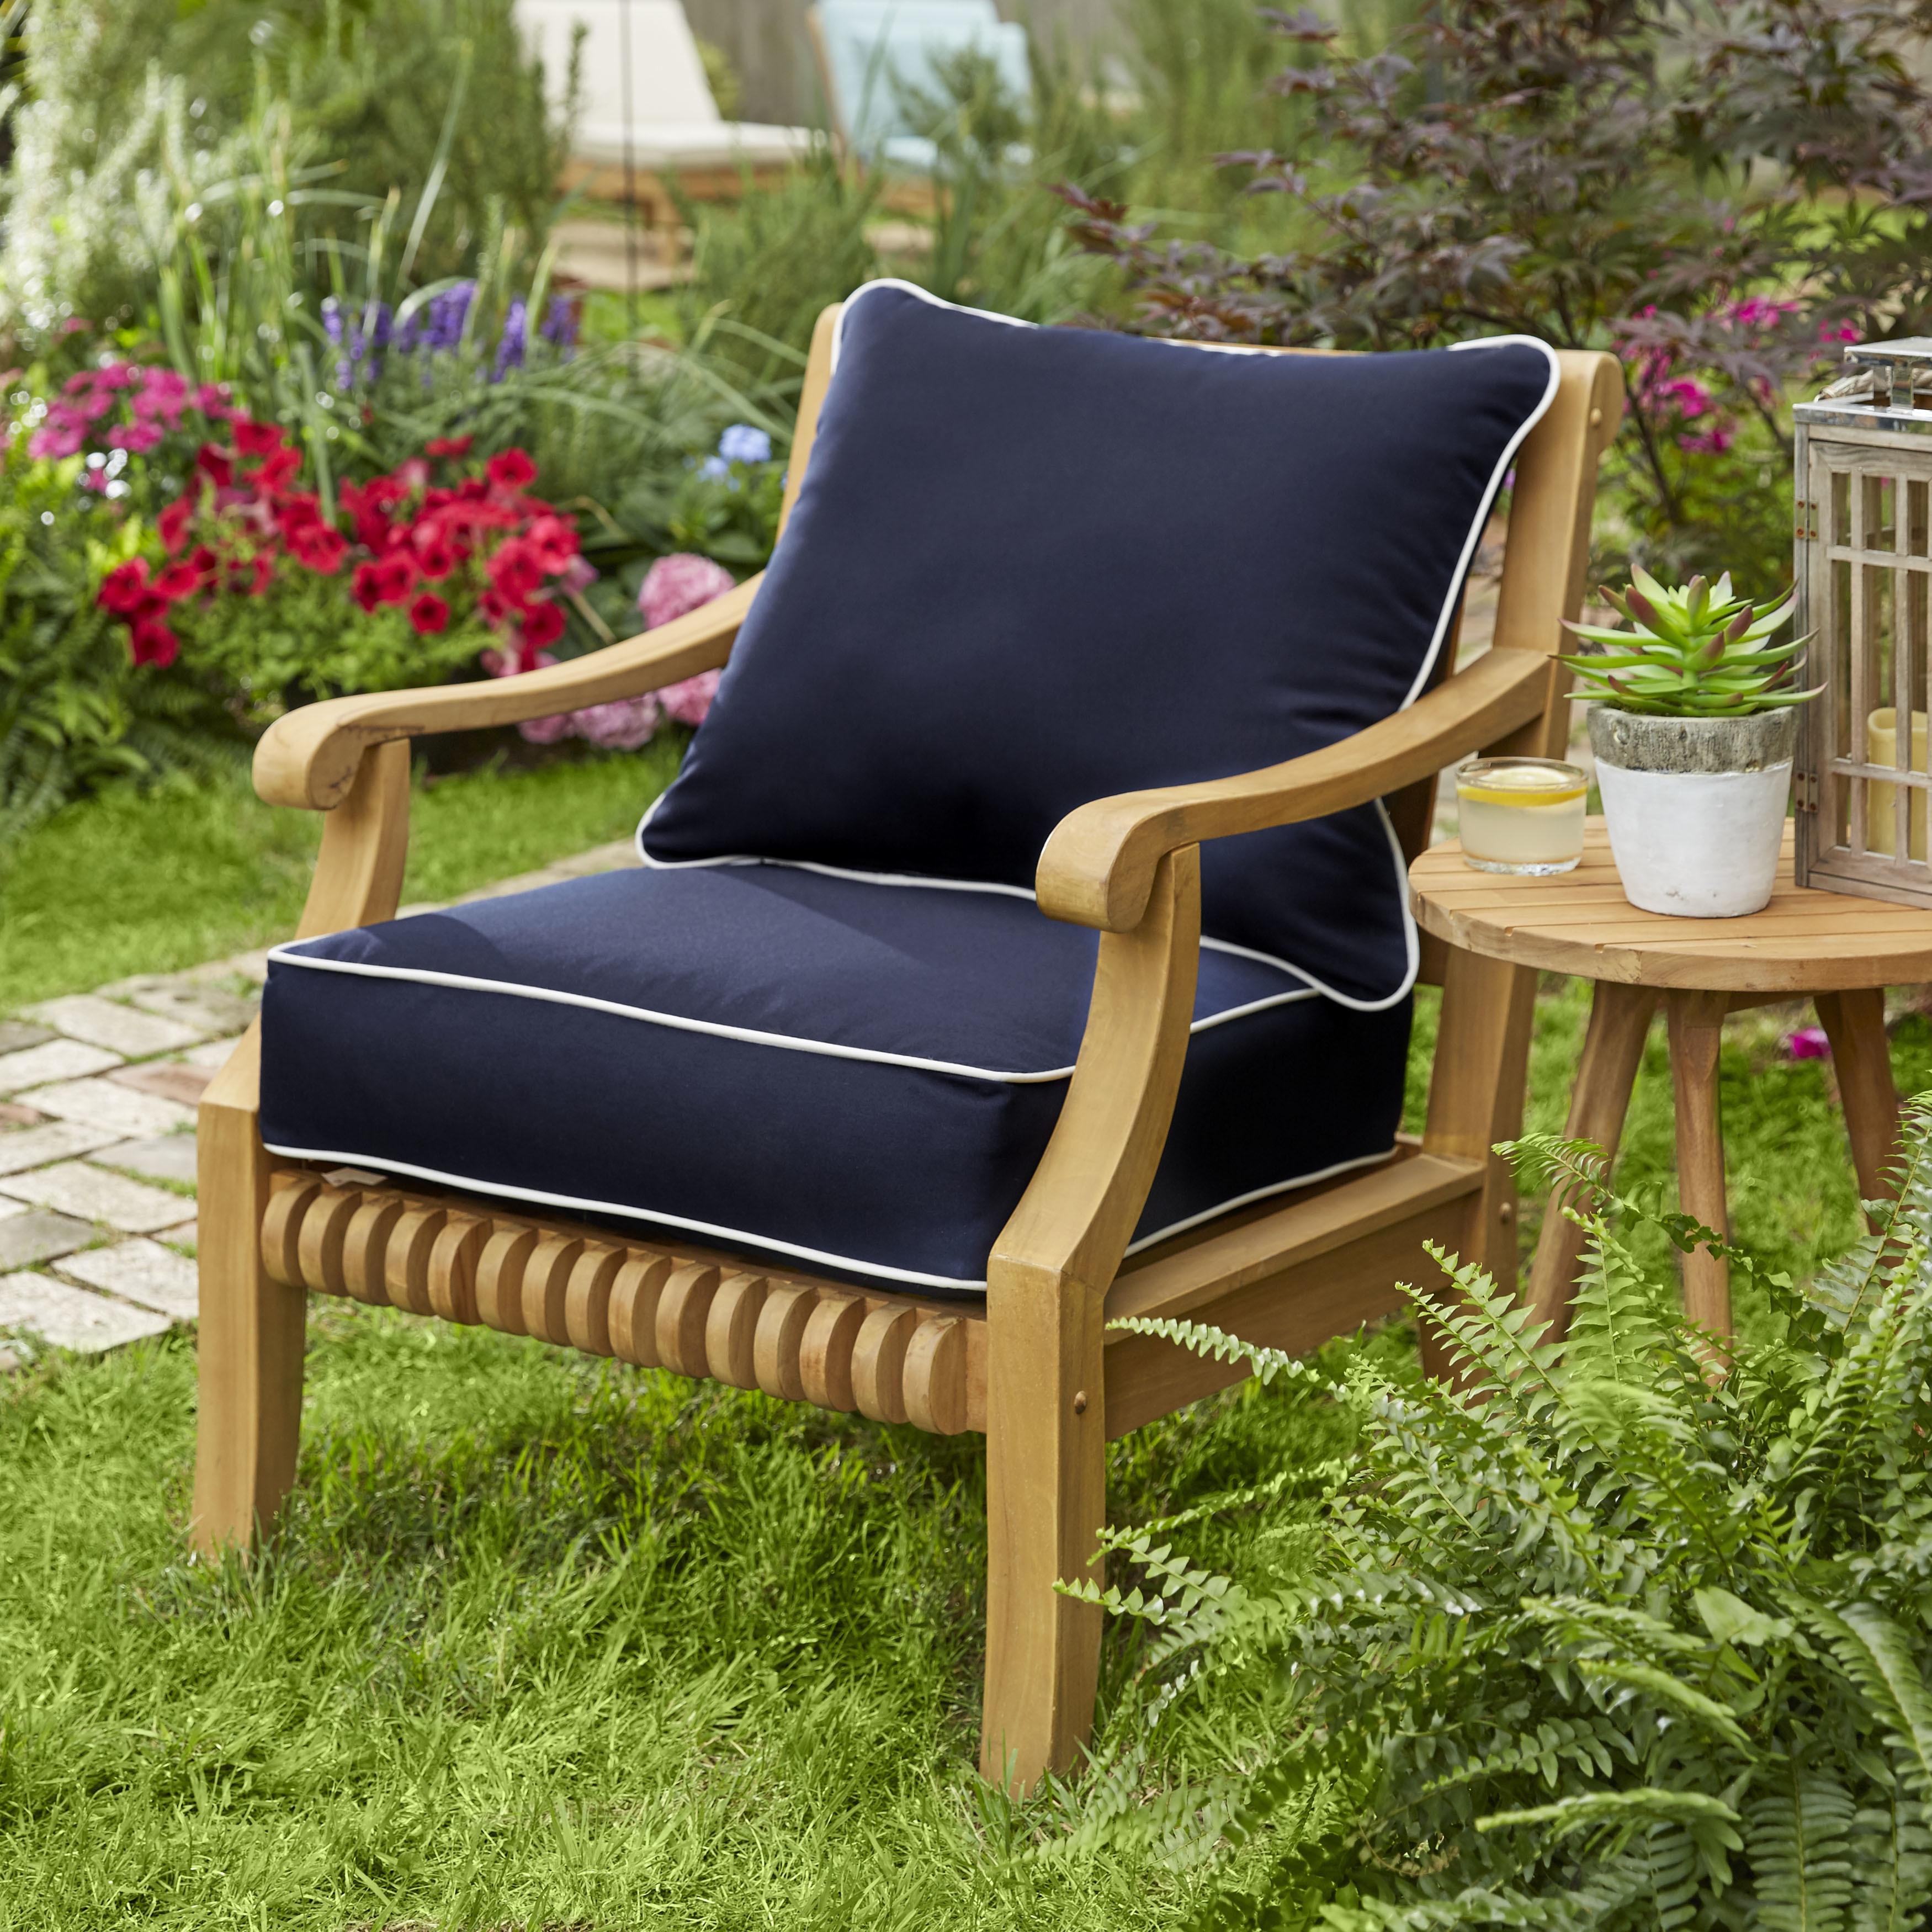 Outdoor Chair Cushion Pillow Set Polyester Fiber Fill Corded Edges  Weatherproof